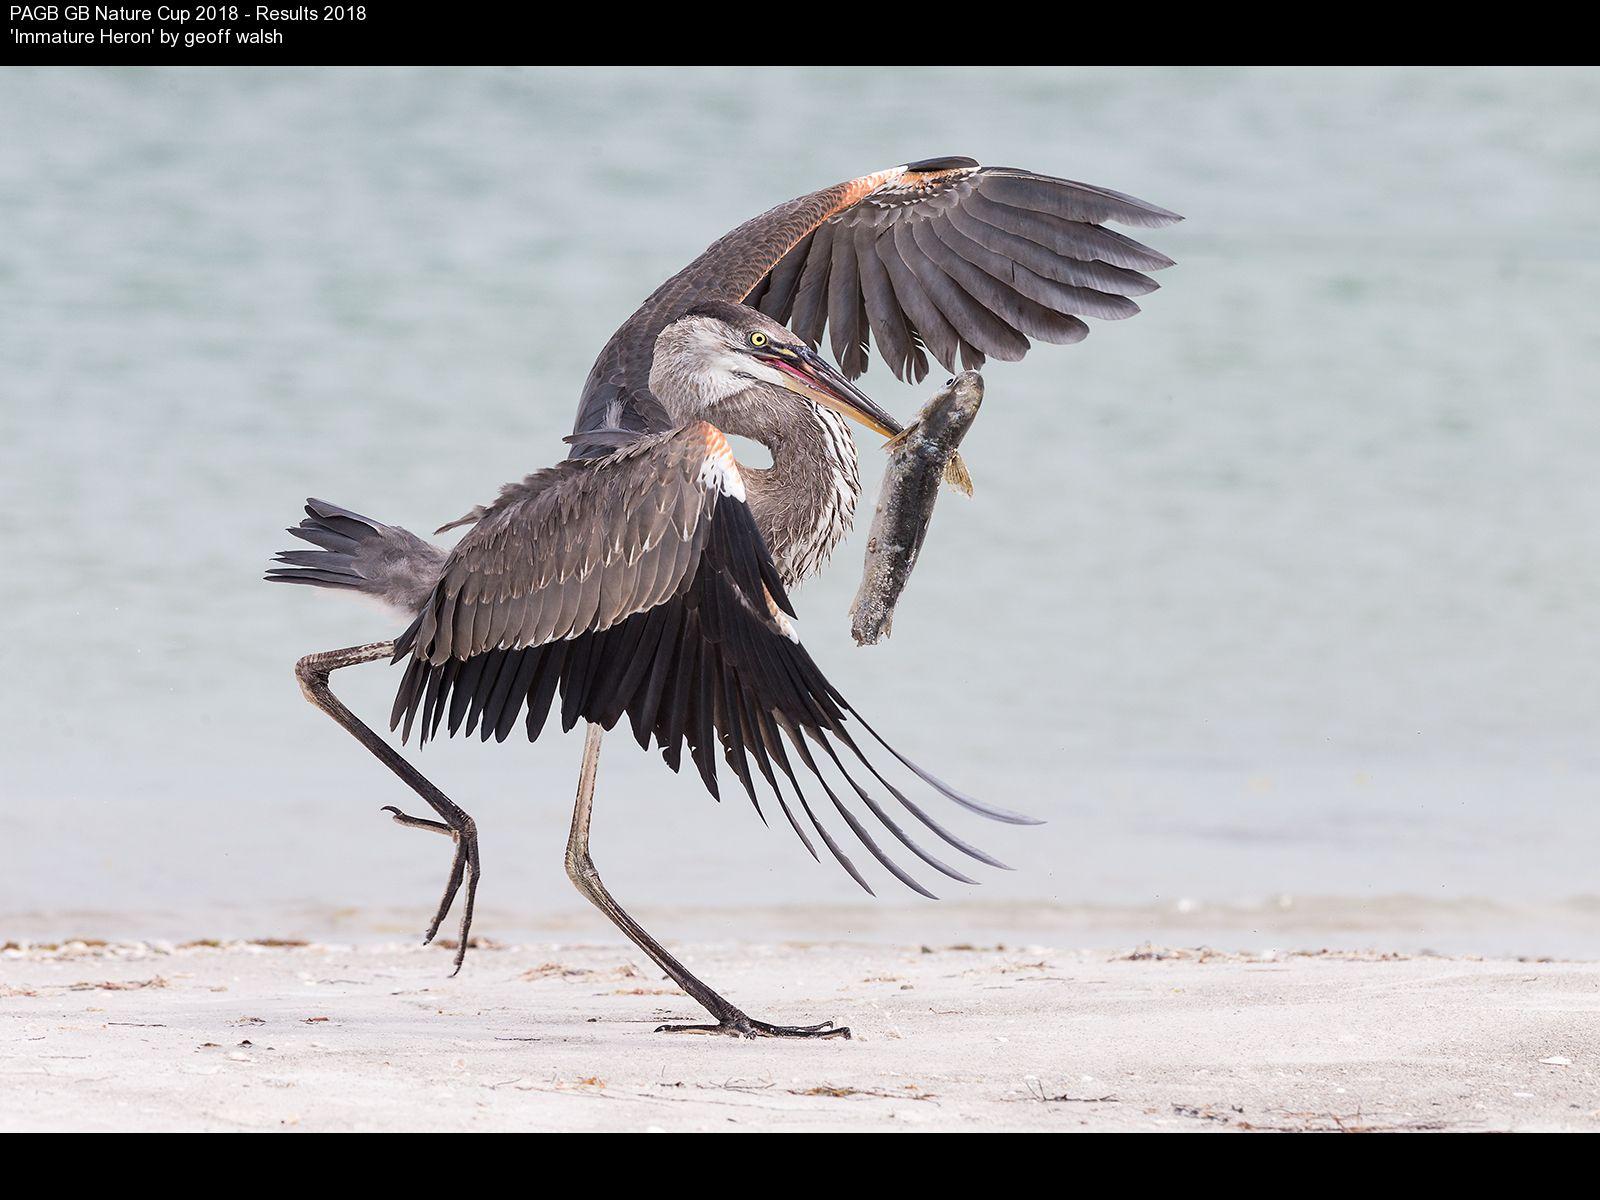 9376_geoff walsh_Immature Heron